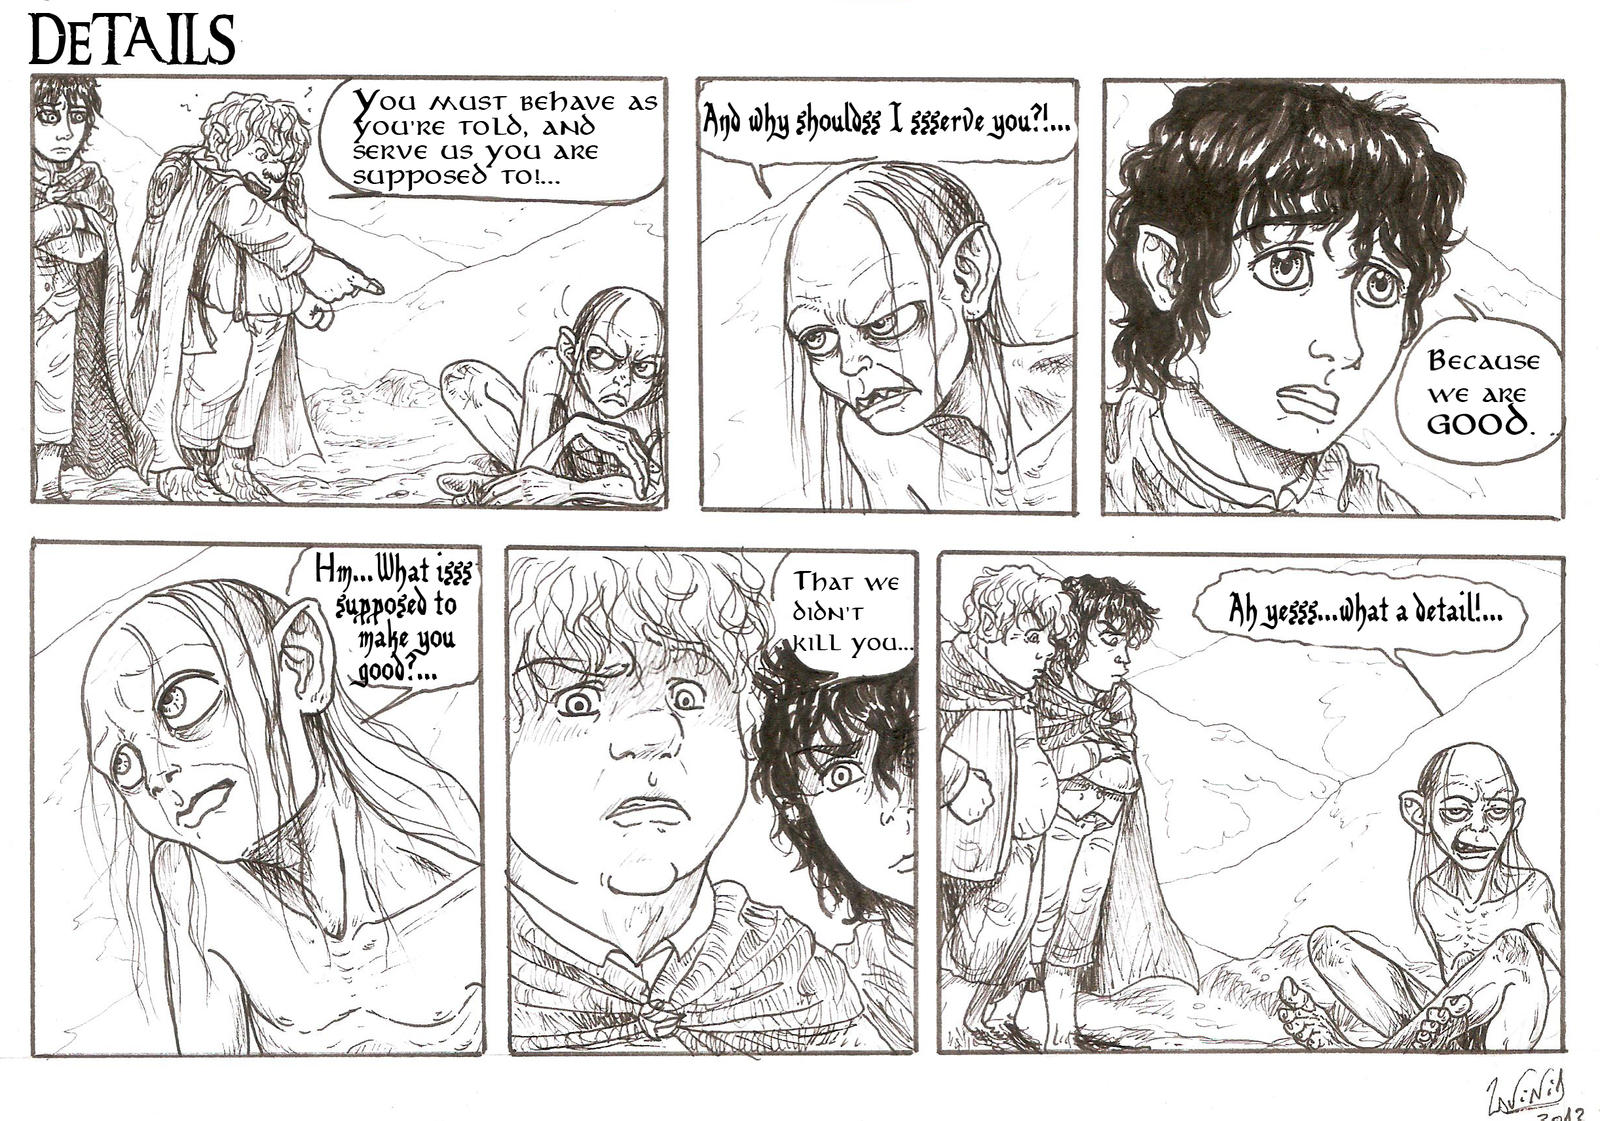 DETAILS strip by smeagolisme